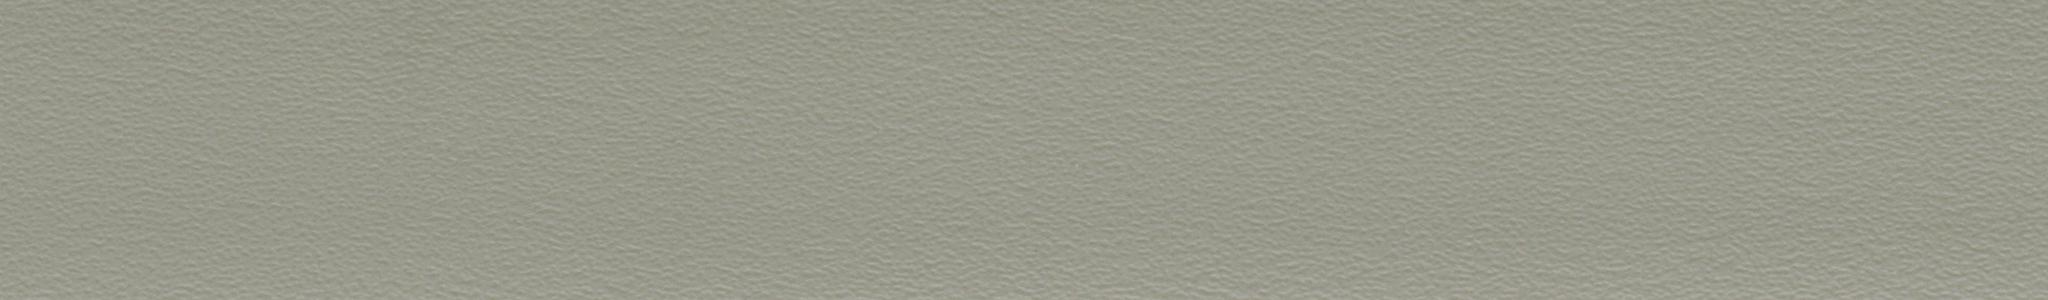 HU 18795 ABS hrana hnědá perla 101